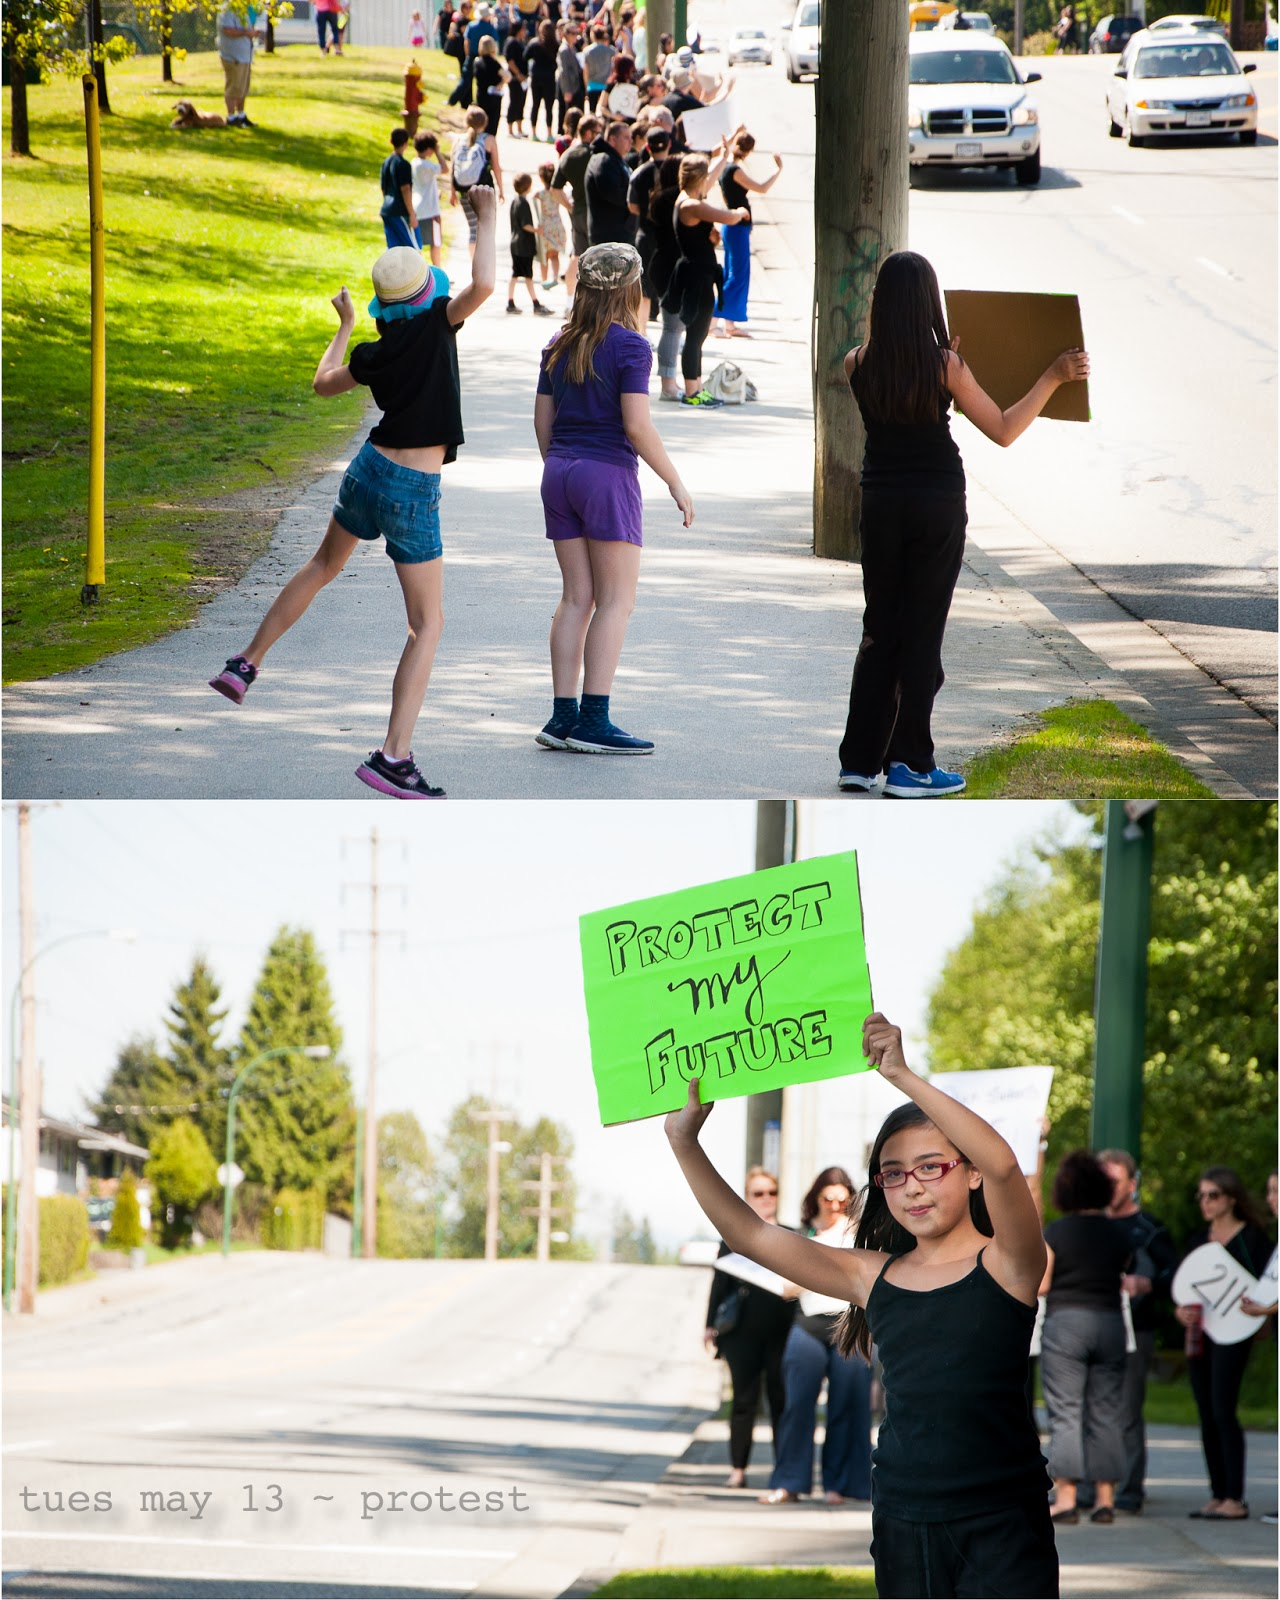 Protest-1.jpg